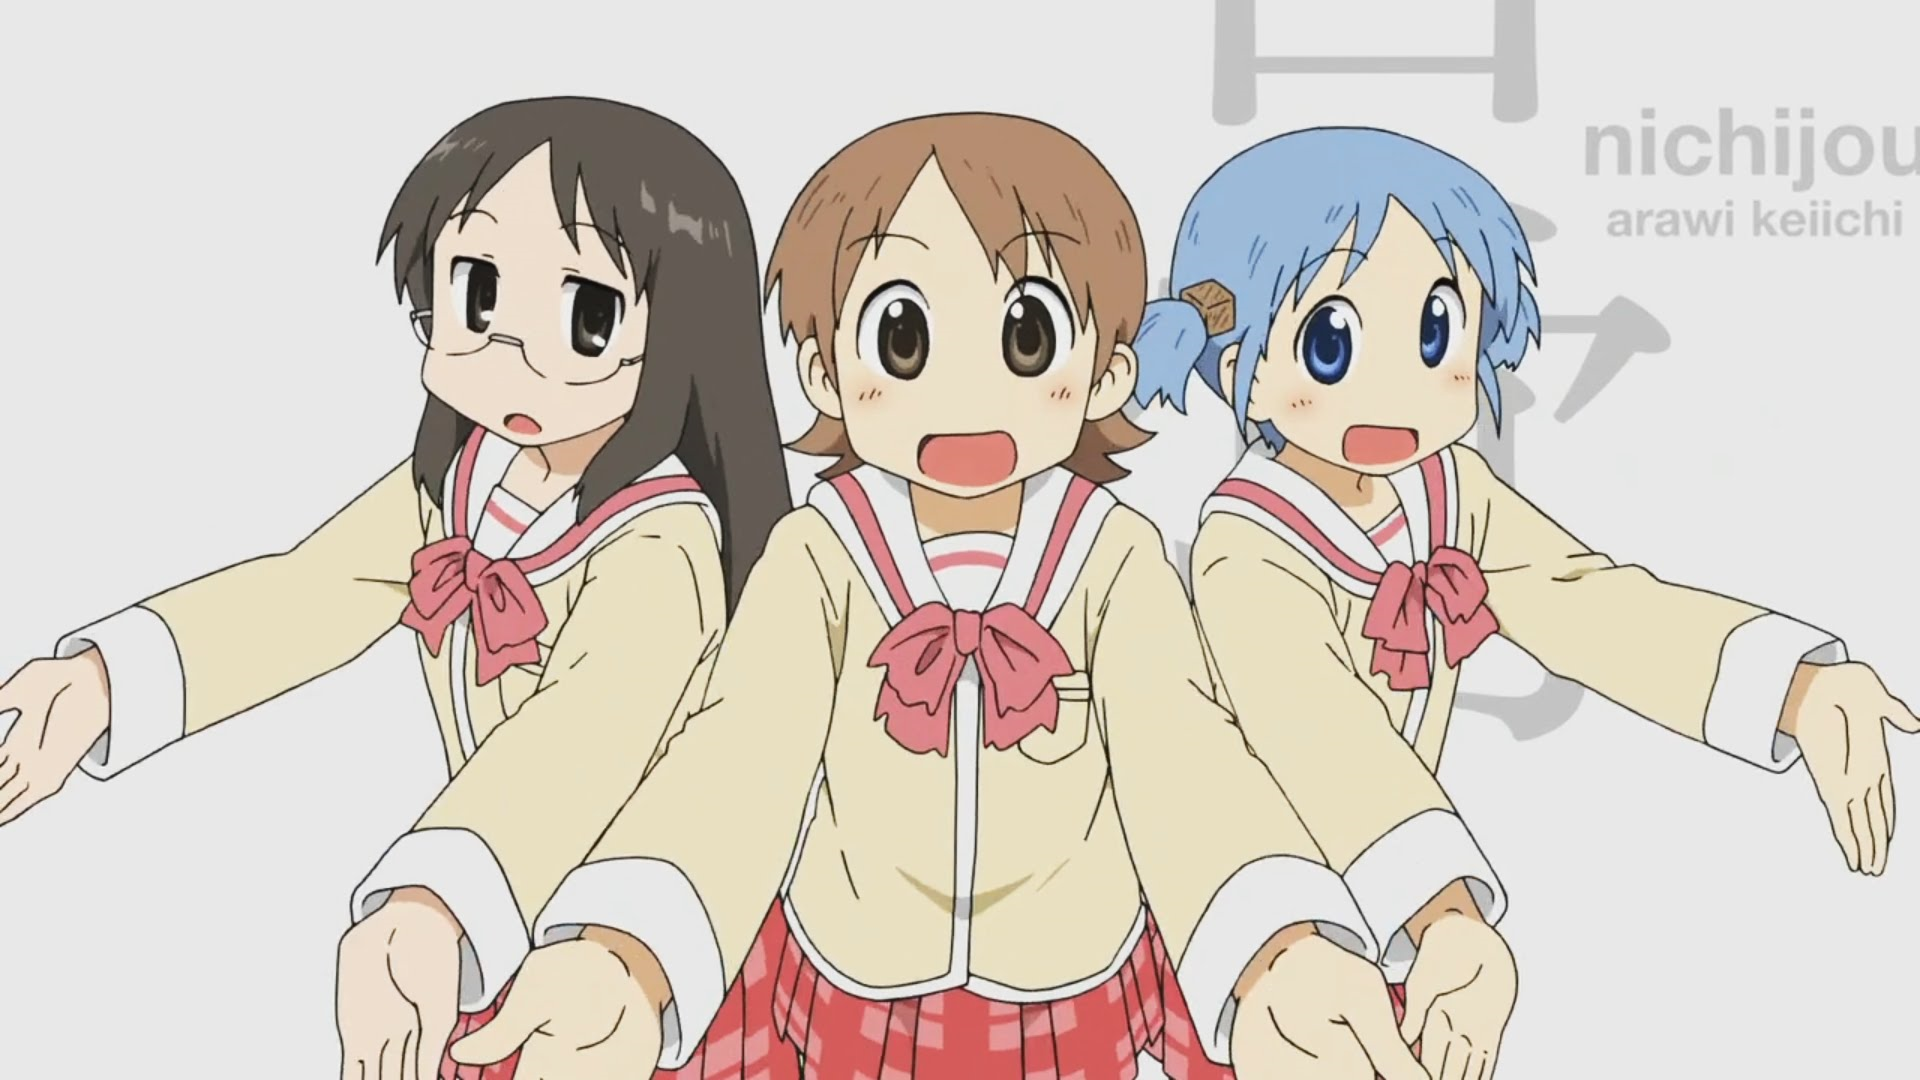 Resultado de imagen para Nichijou